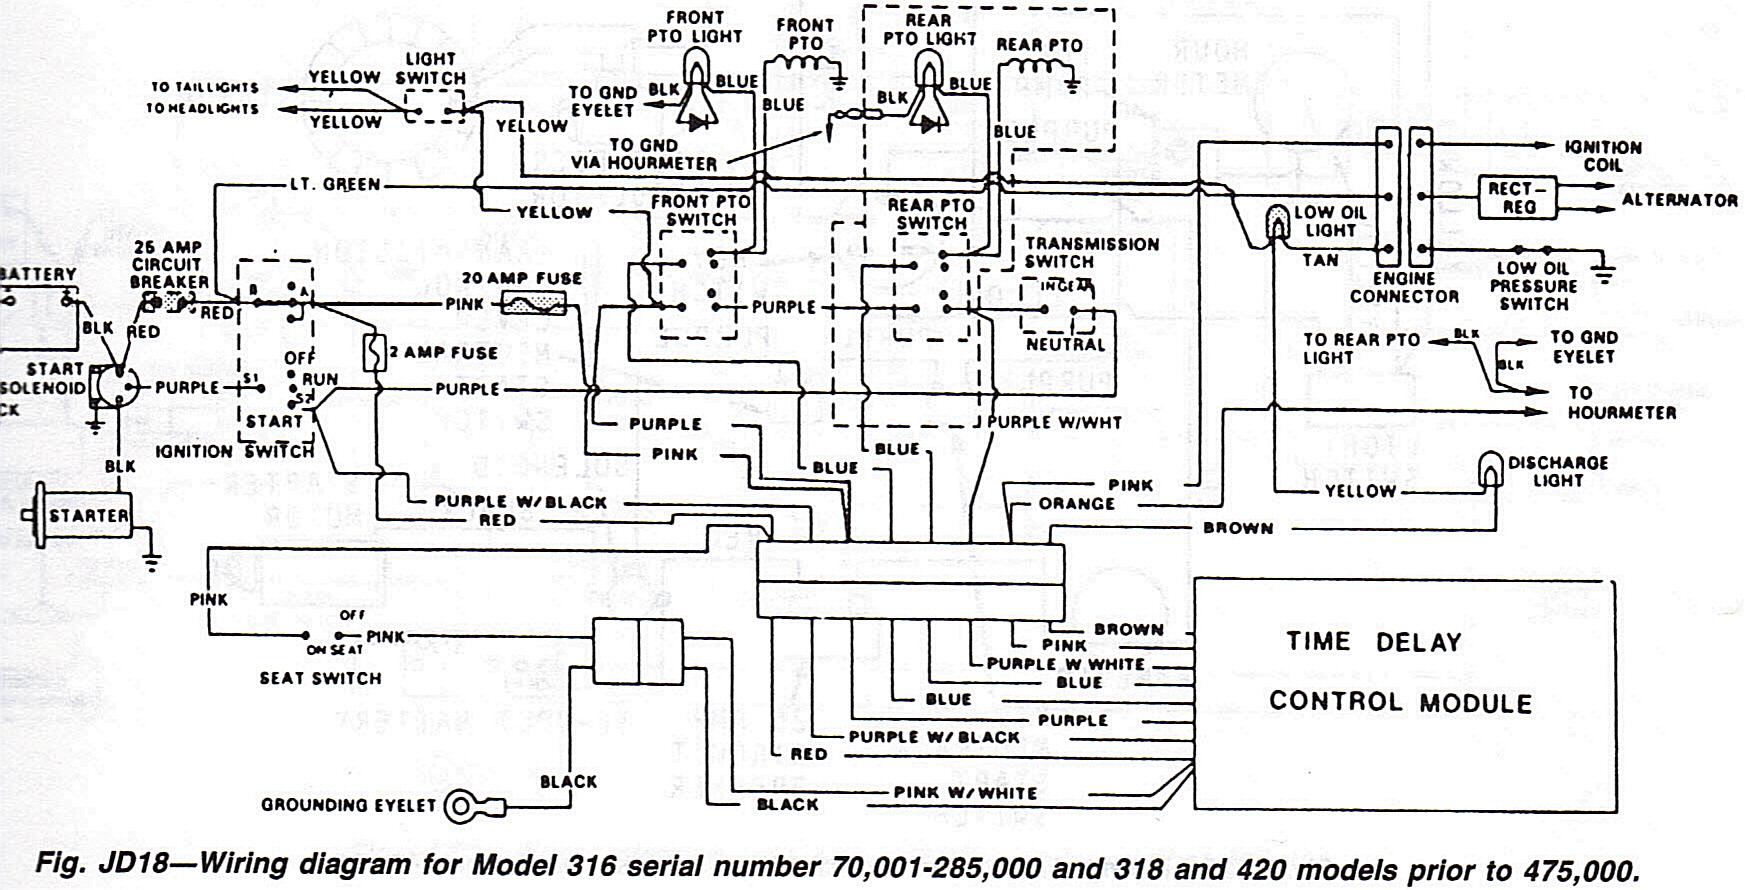 john deere 420 wiring diagram  | 1050 x 800